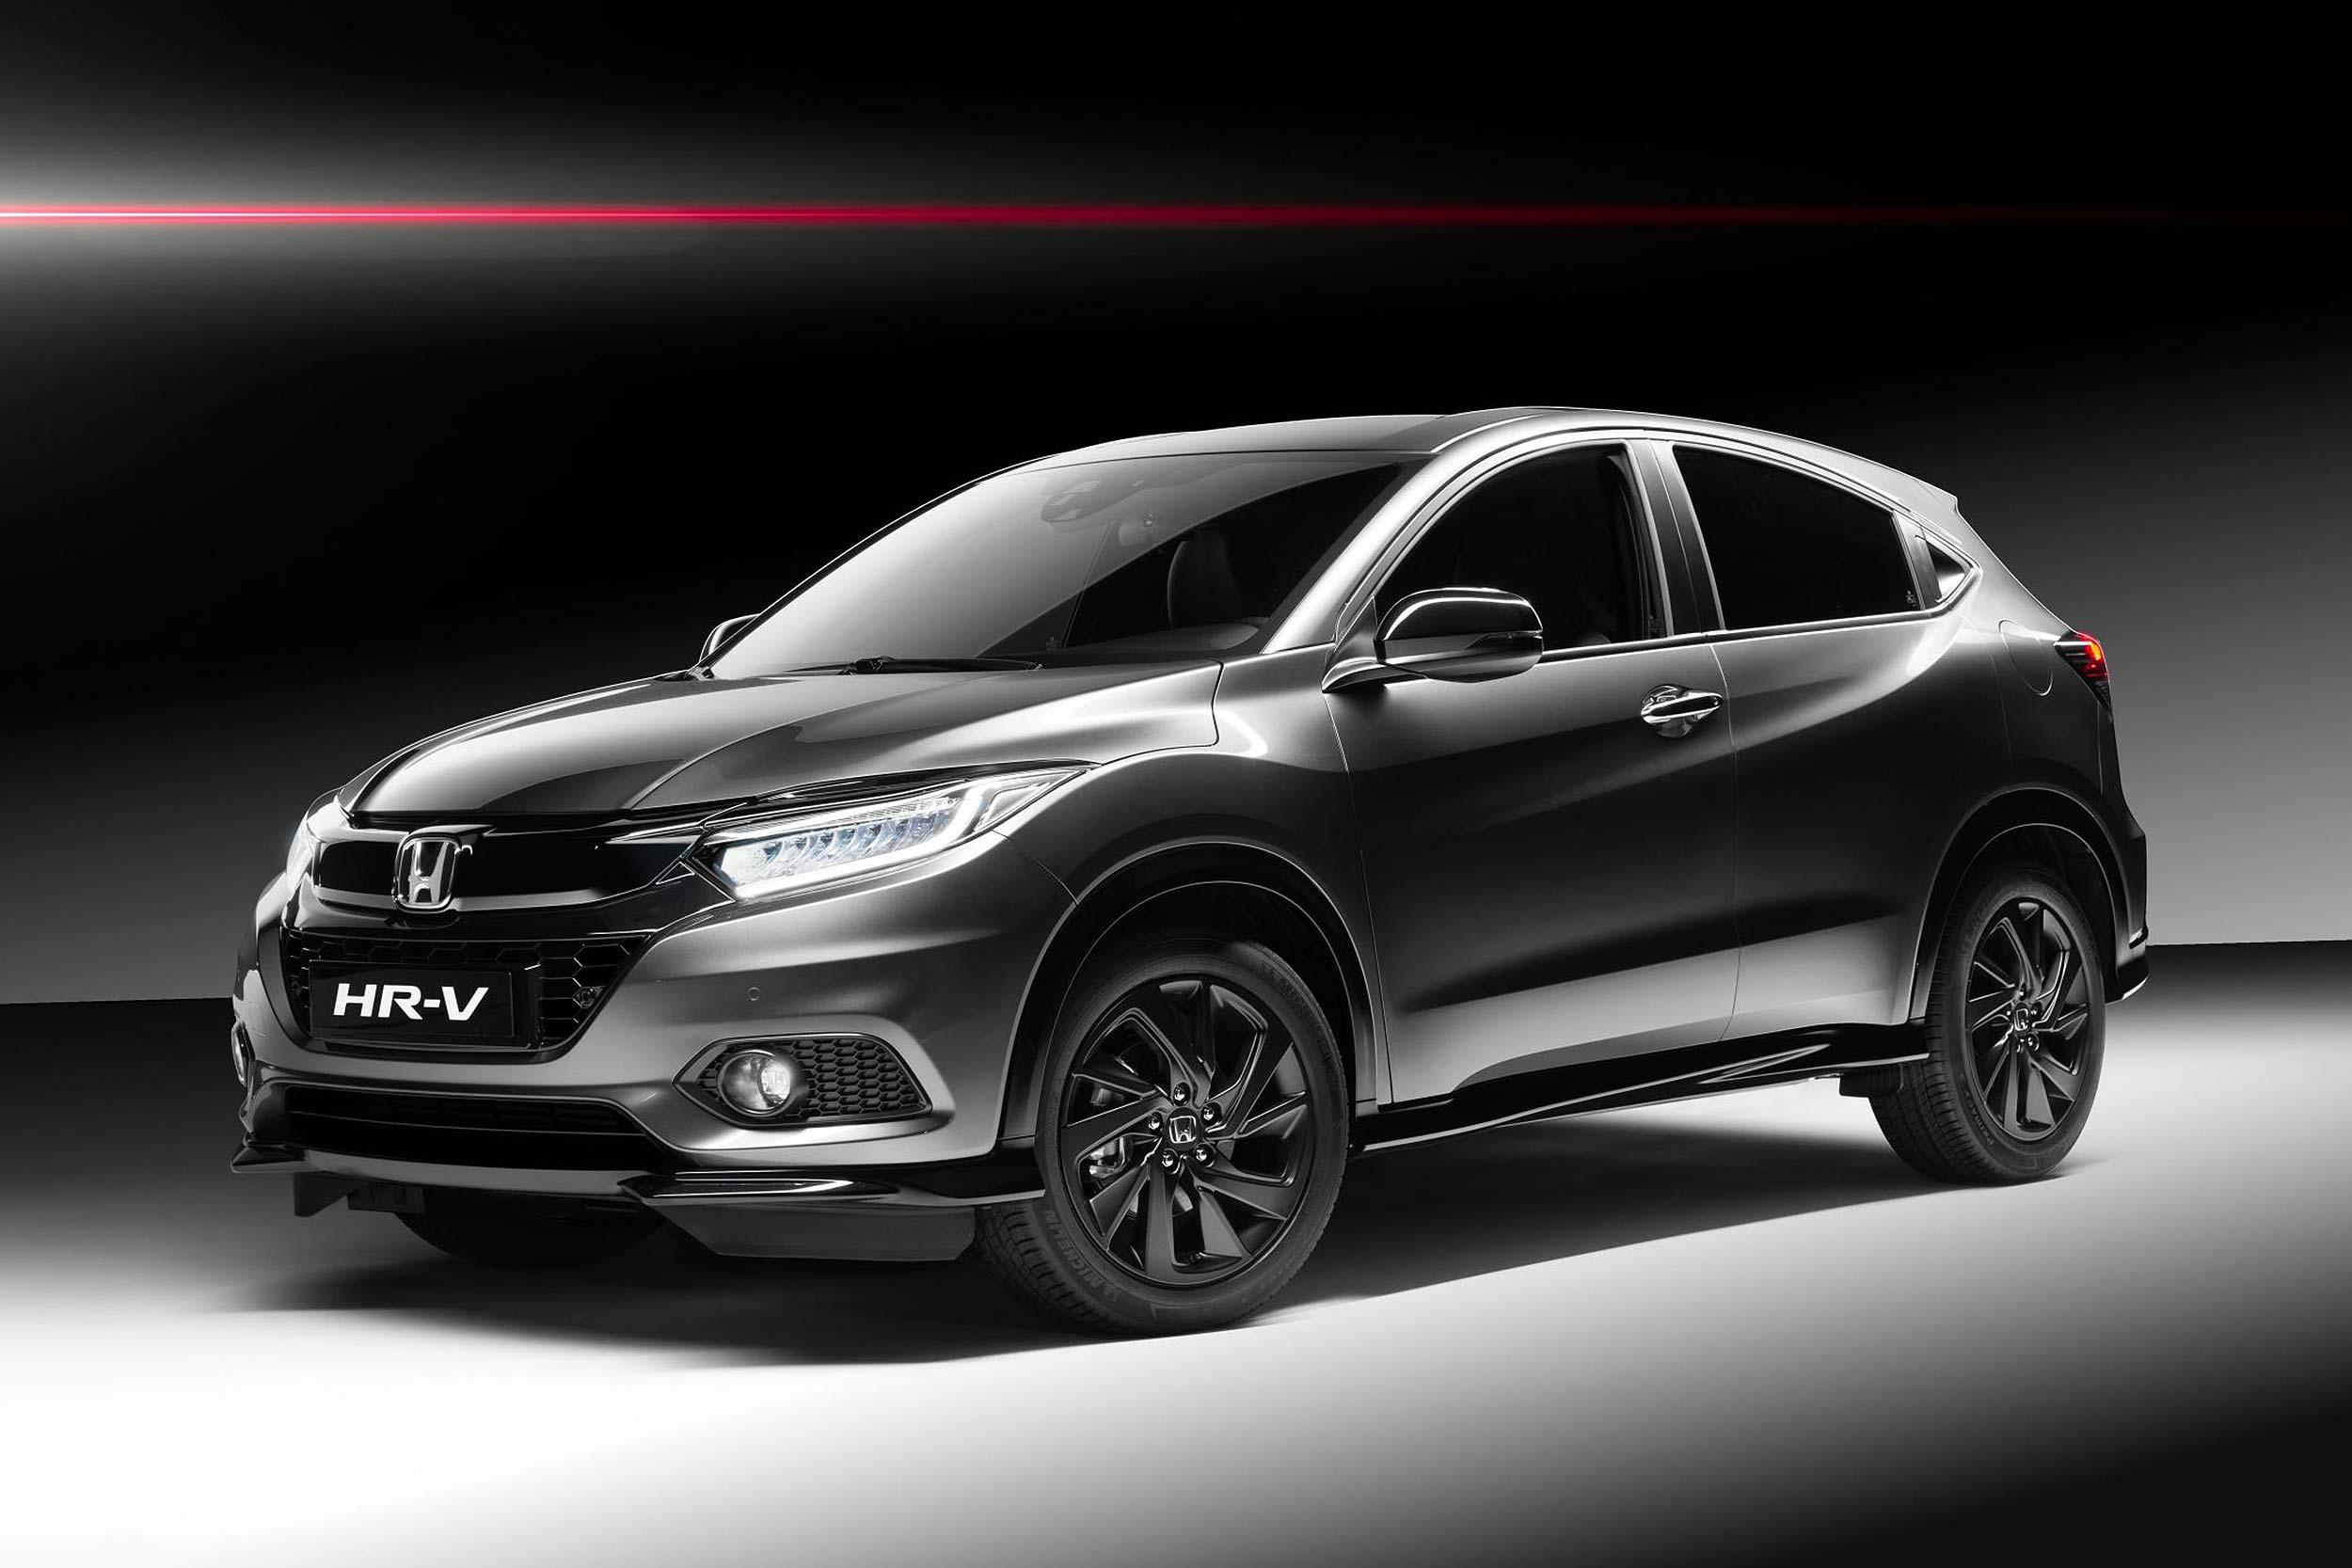 2019 Honda HR-V Sport front